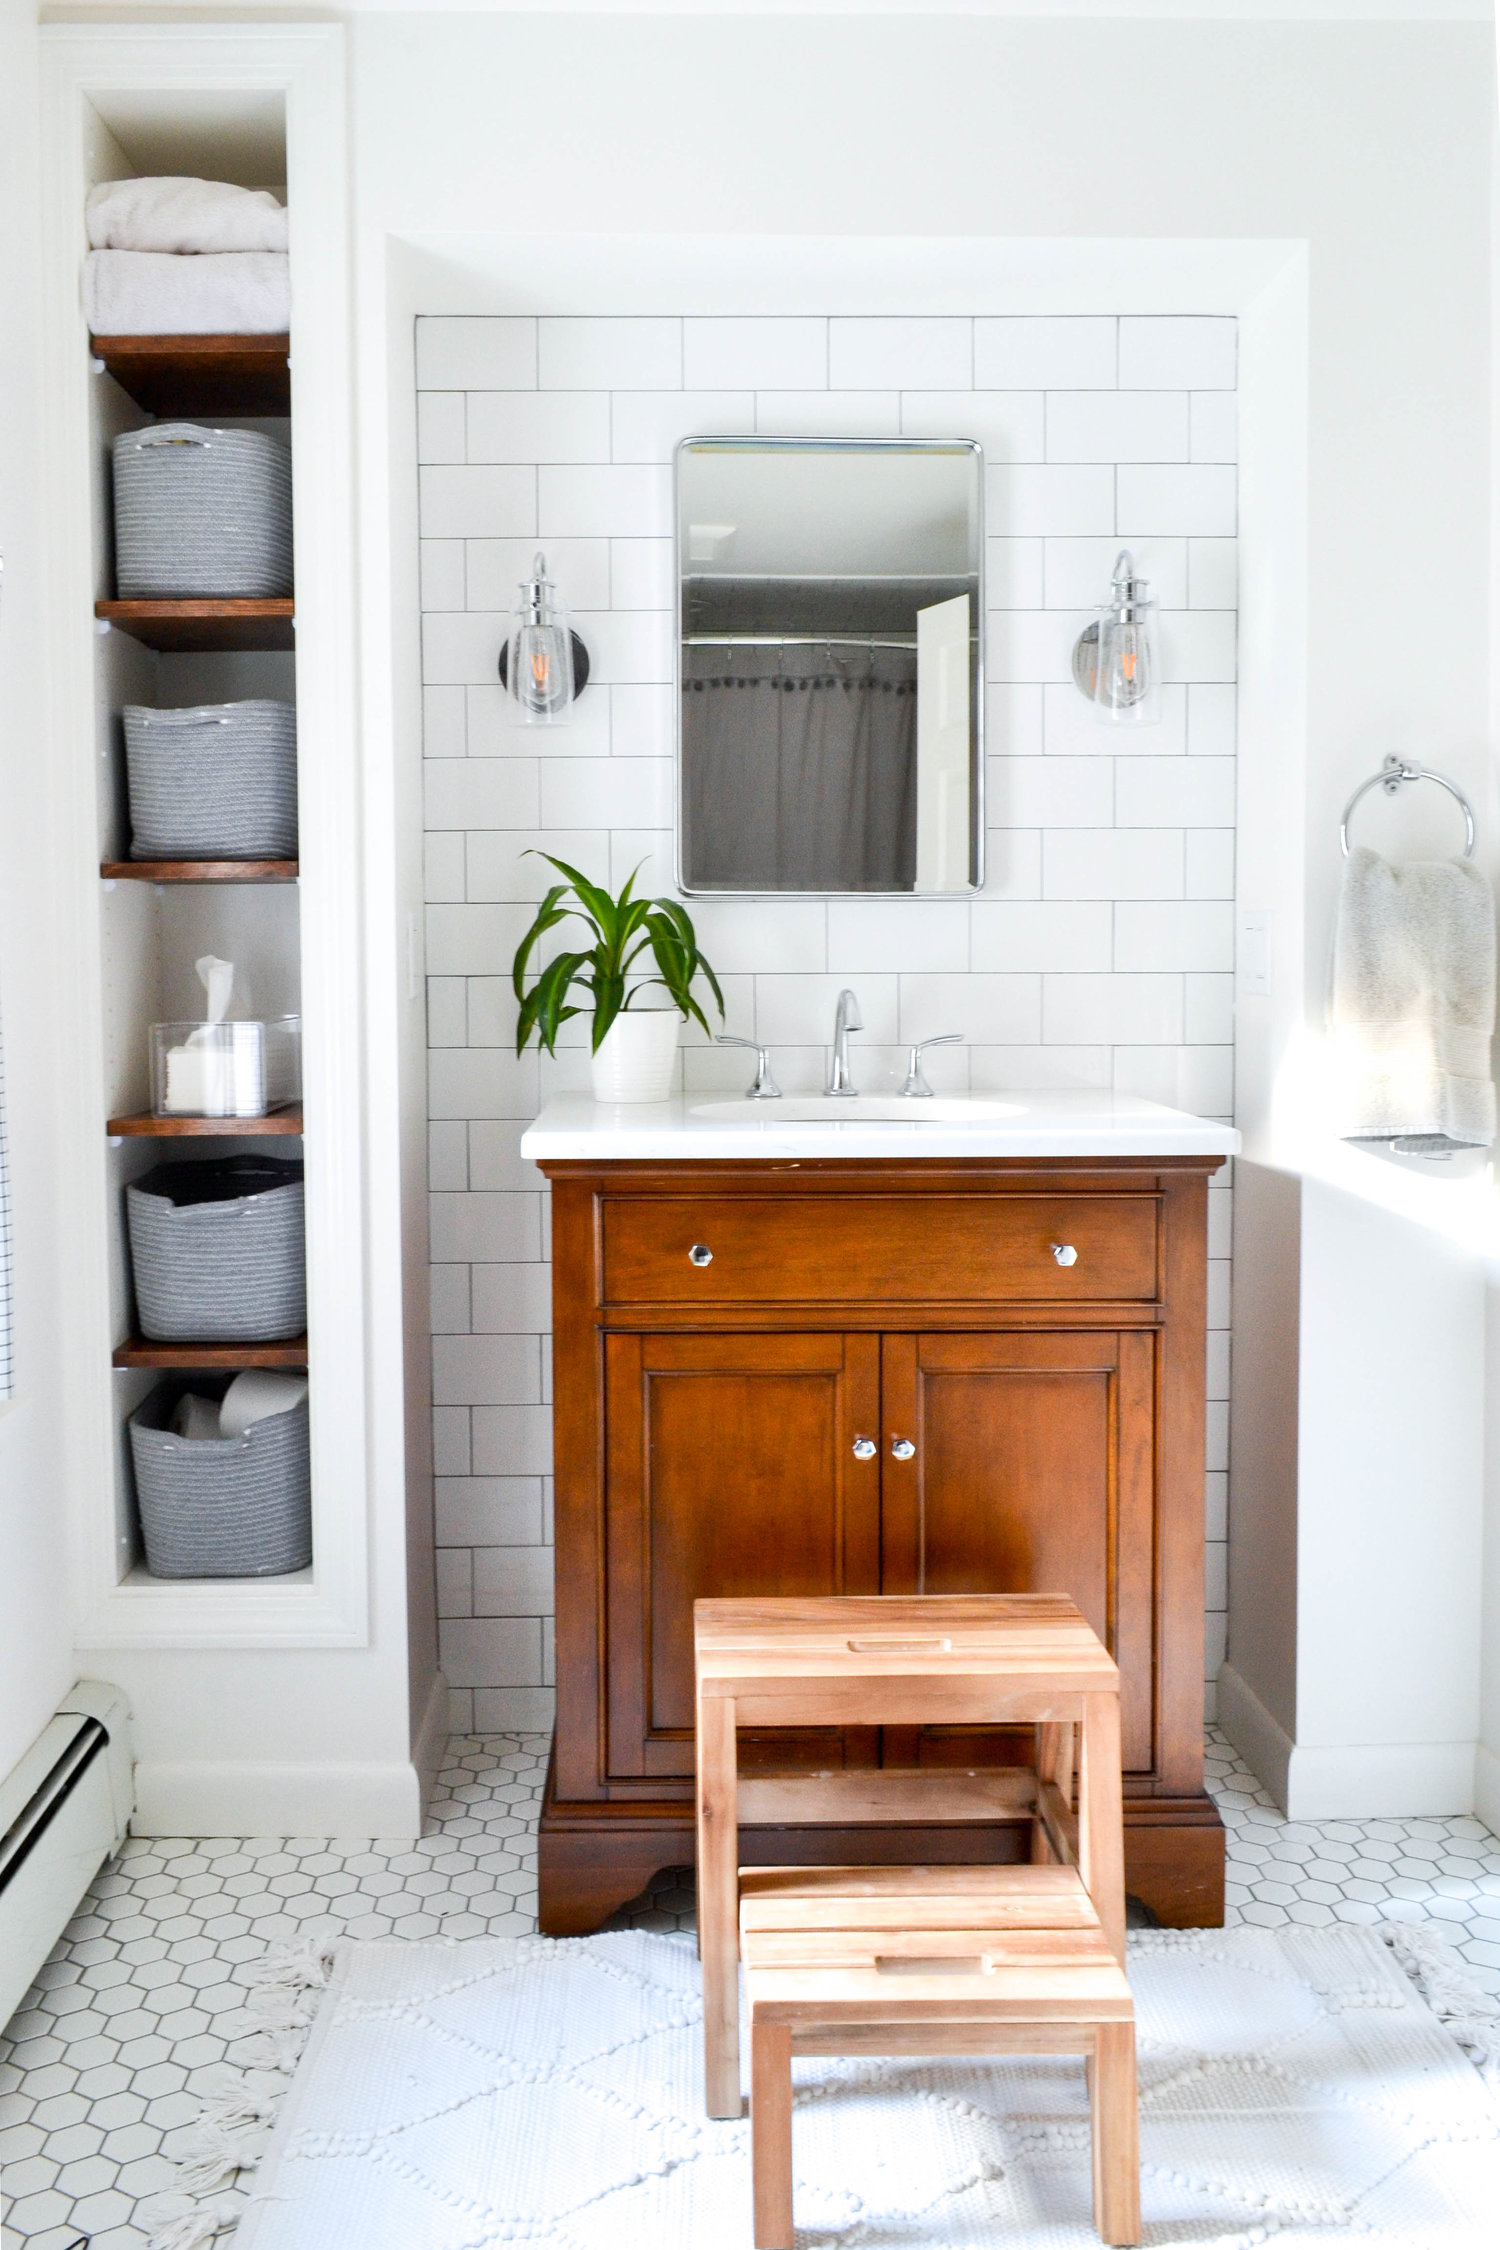 Design by  Gray Oak Interiors